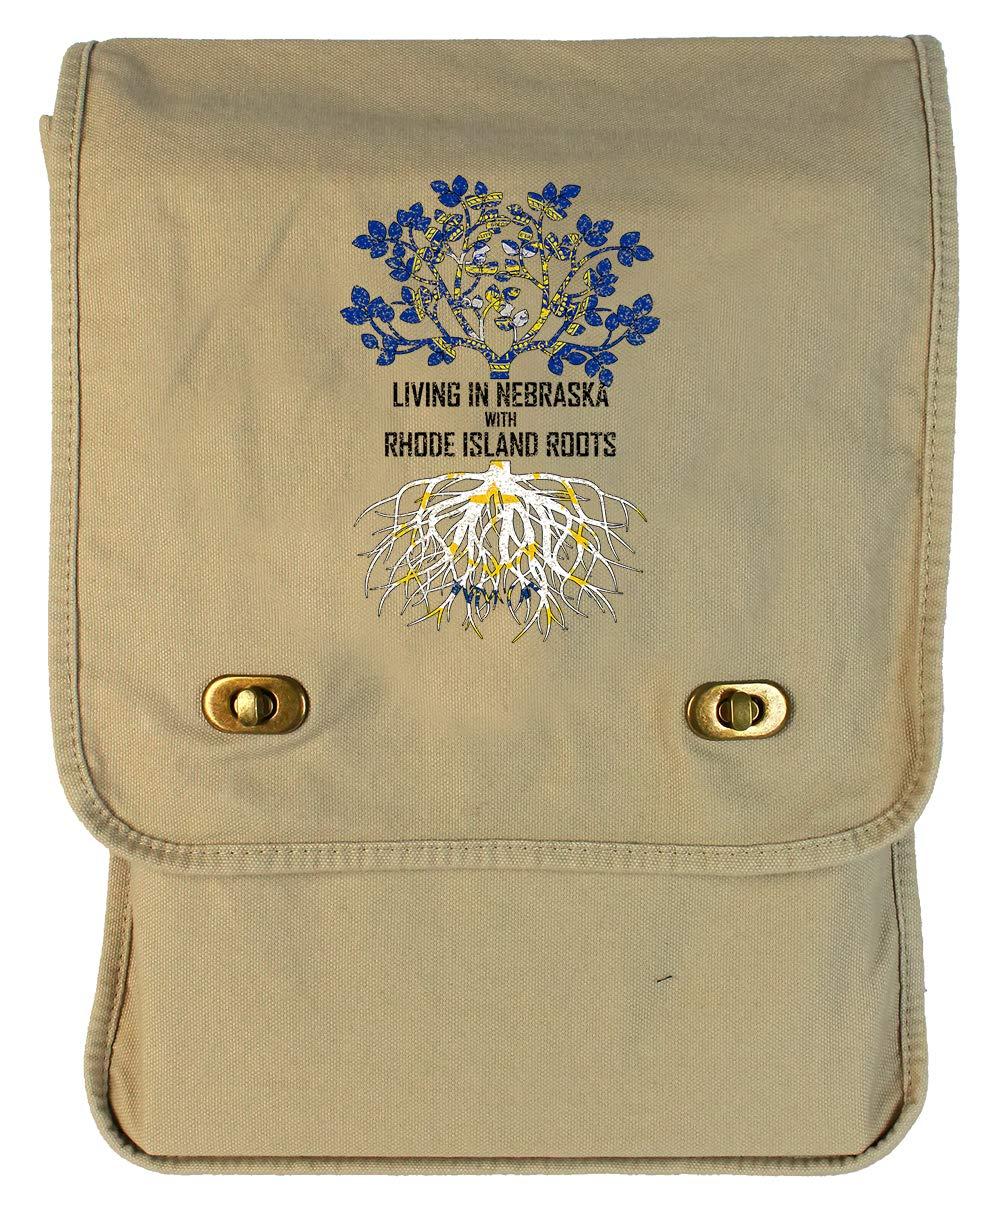 Tenacitee Living In Nebraska with Rhode Island Roots Grey Brushed Canvas Messenger Bag